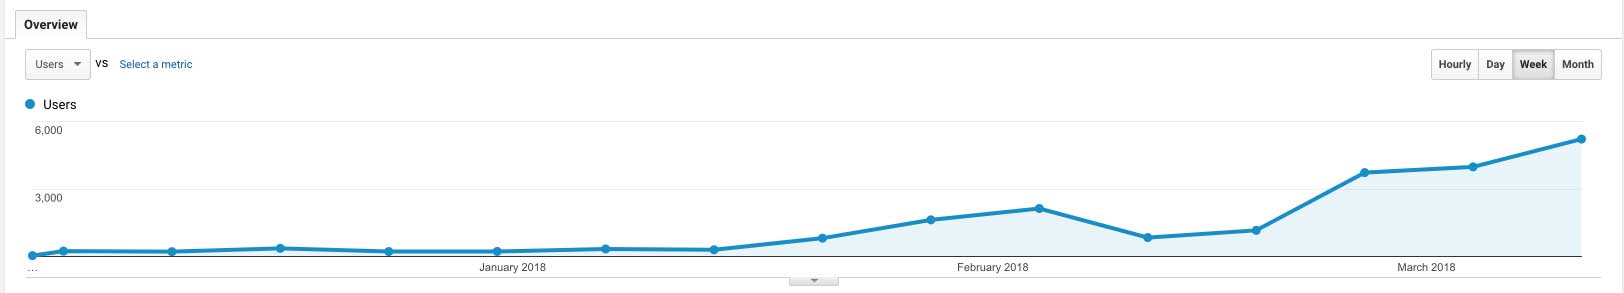 altcoin fantasy user growth